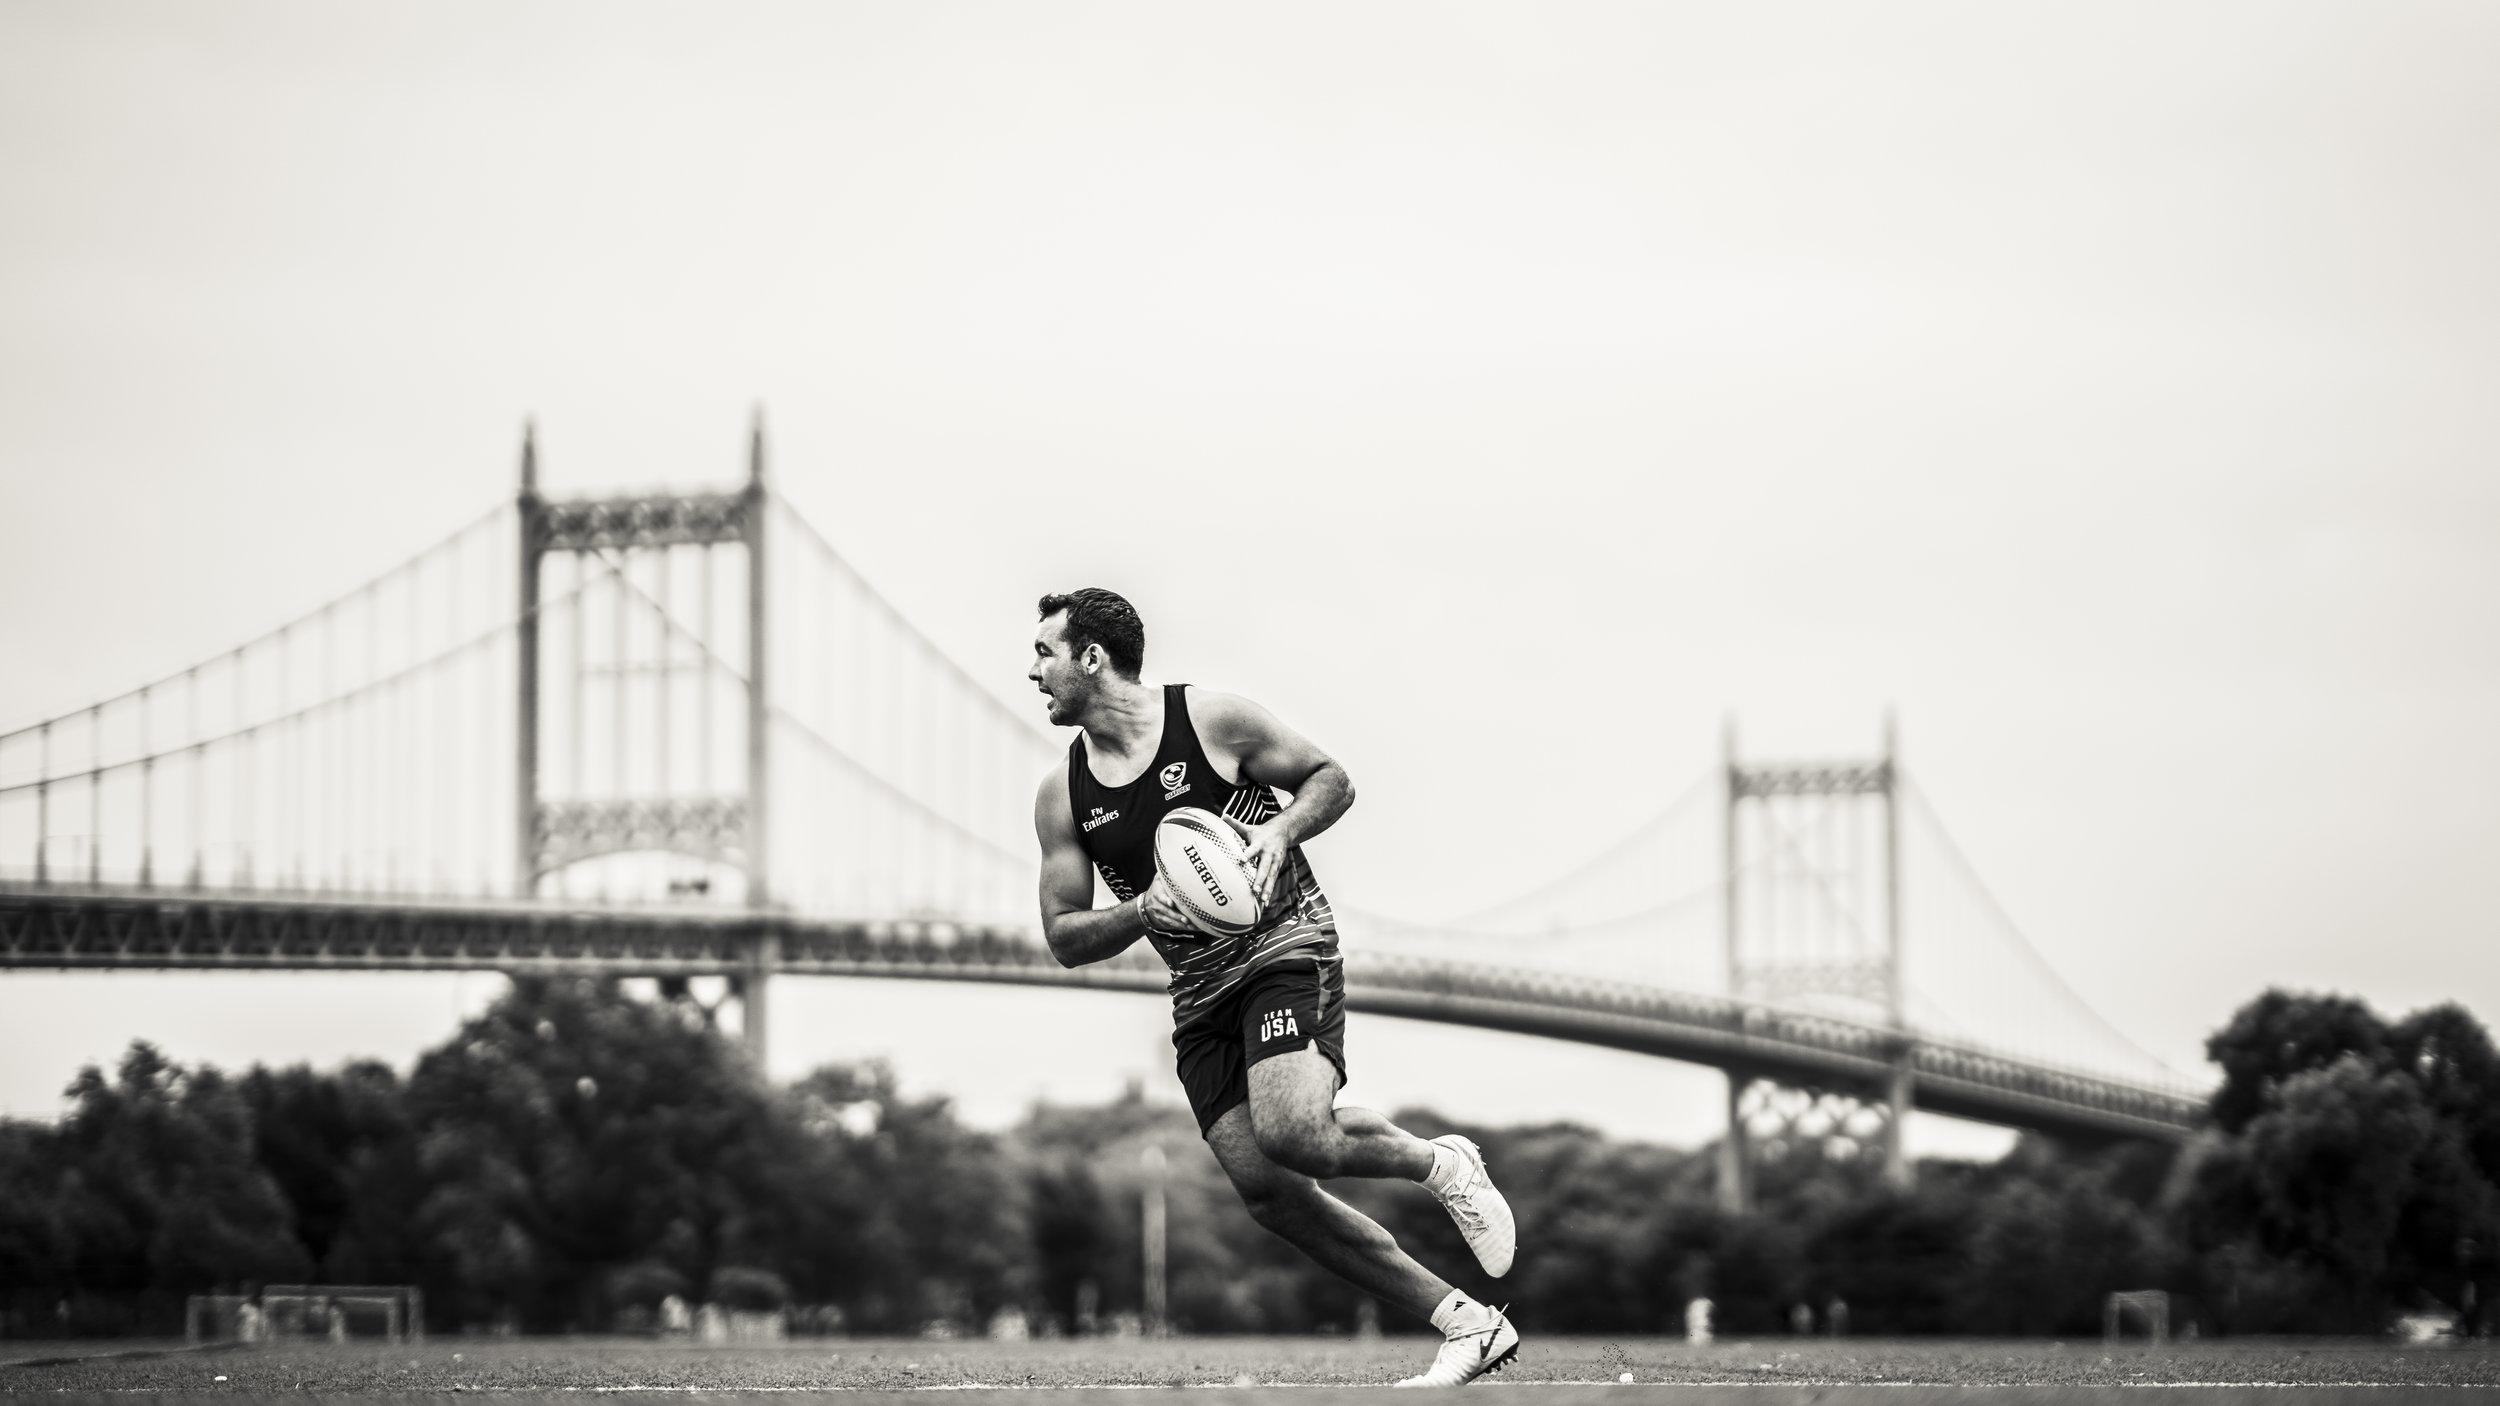 USA Rugby_Chris Mattina-17.jpg